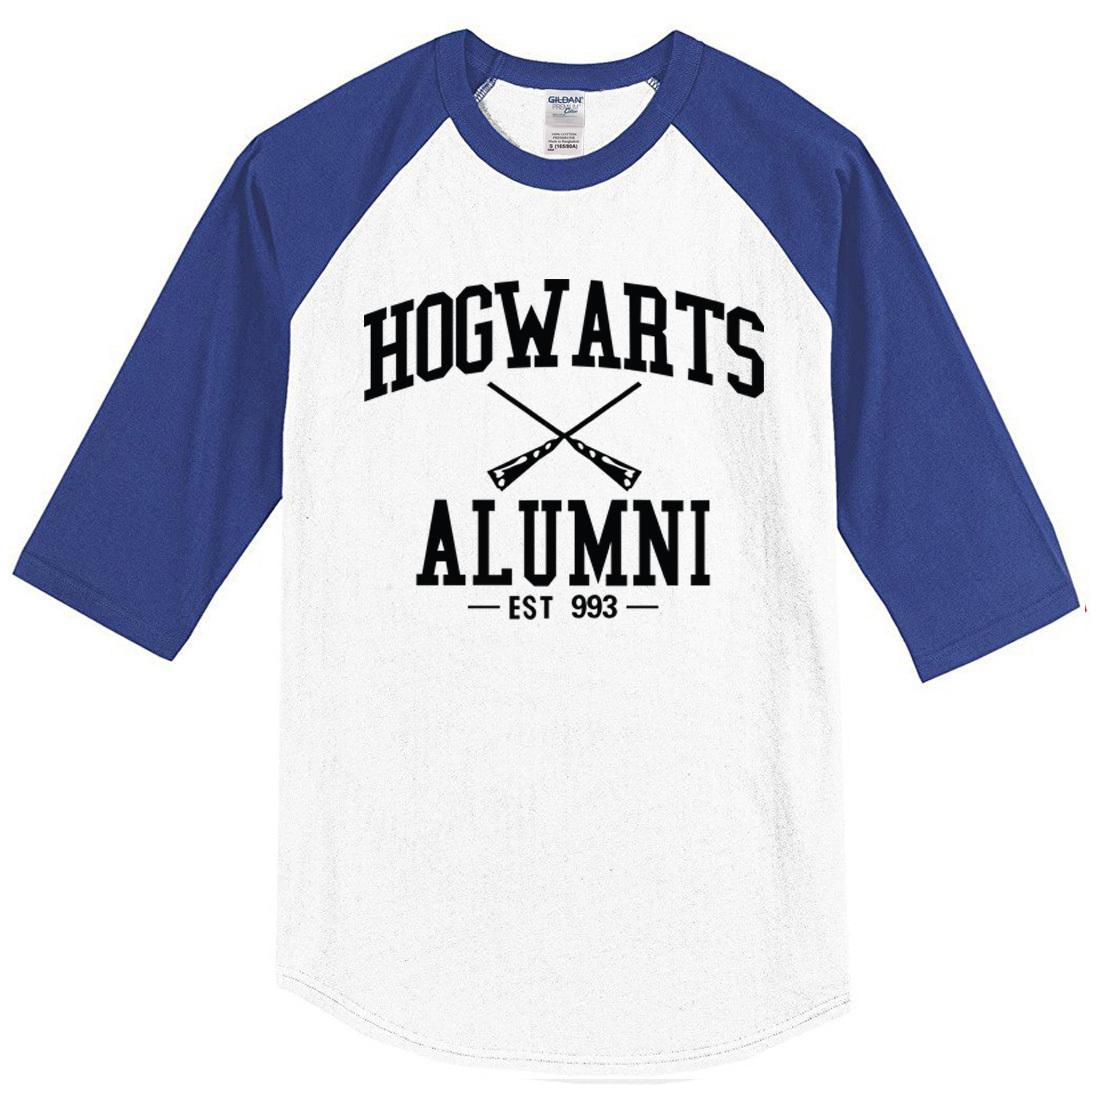 40e9eacb4d7 Hot 2019 Men s T-shirts Hogwarts Alumni Print O-neck Cotton T-shirt Jersey  Homme Crossfit T Shirt Men Crossfit Harajuku Top Tee